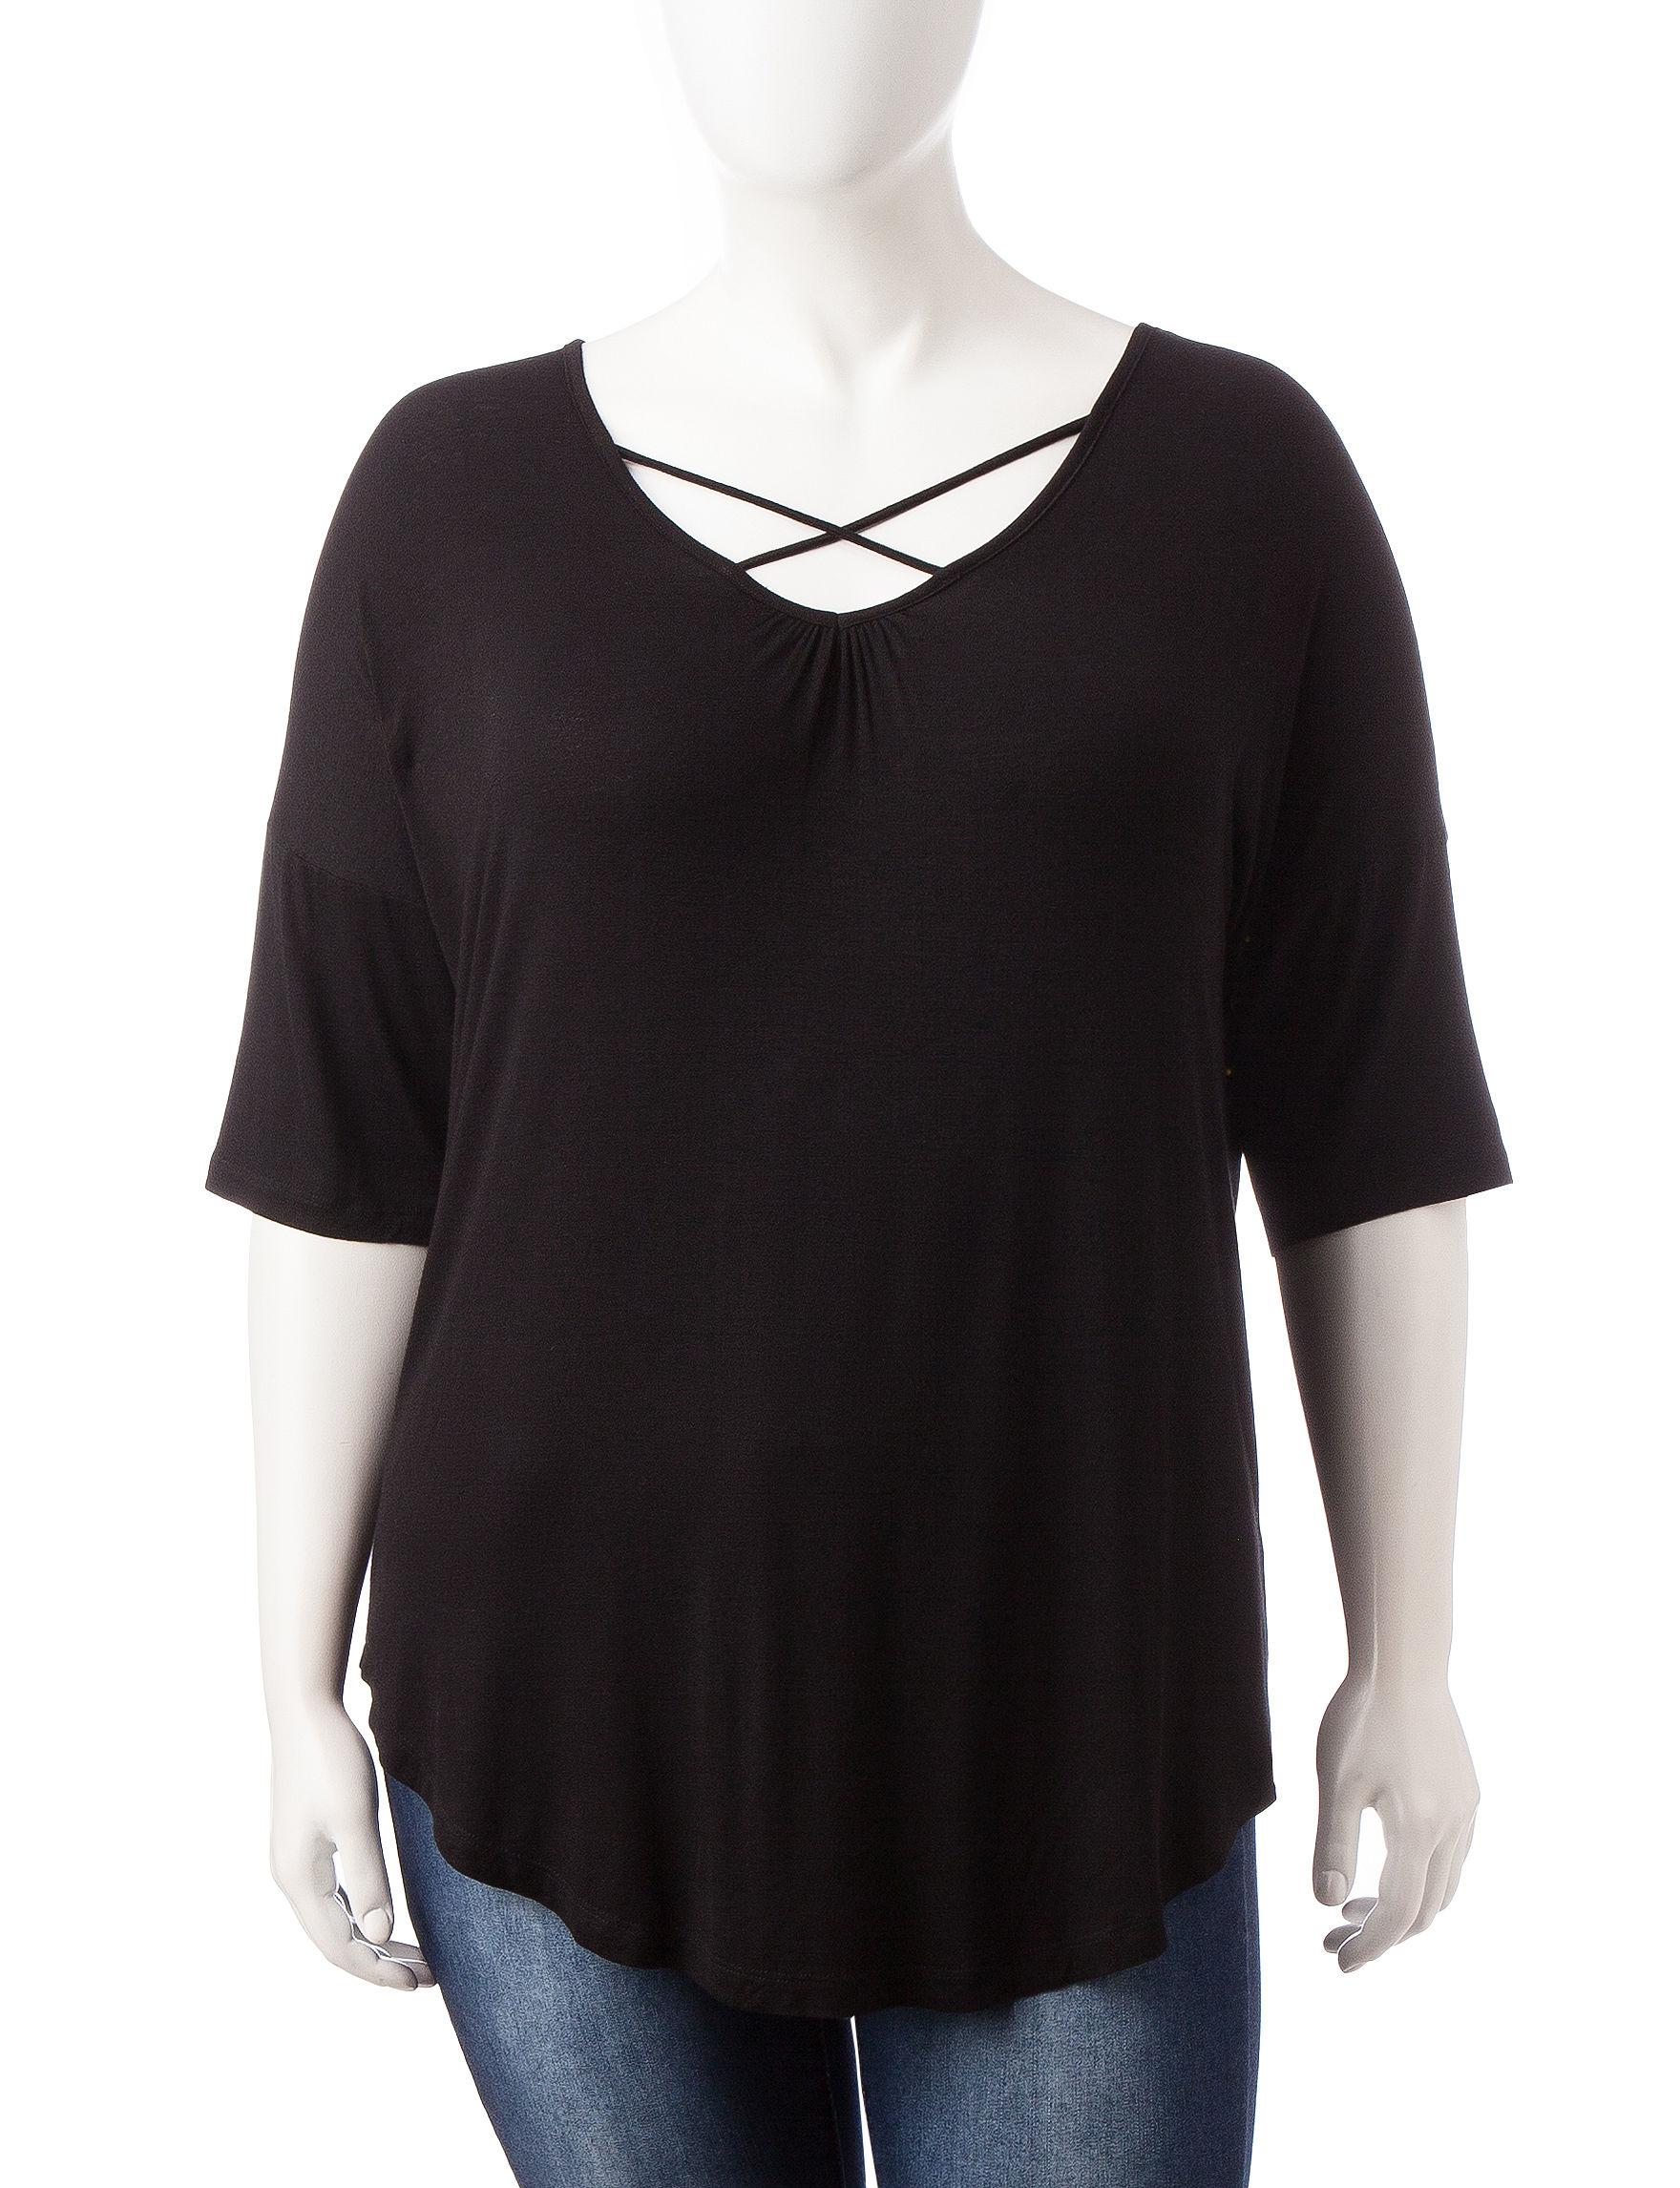 Justify Black Shirts & Blouses